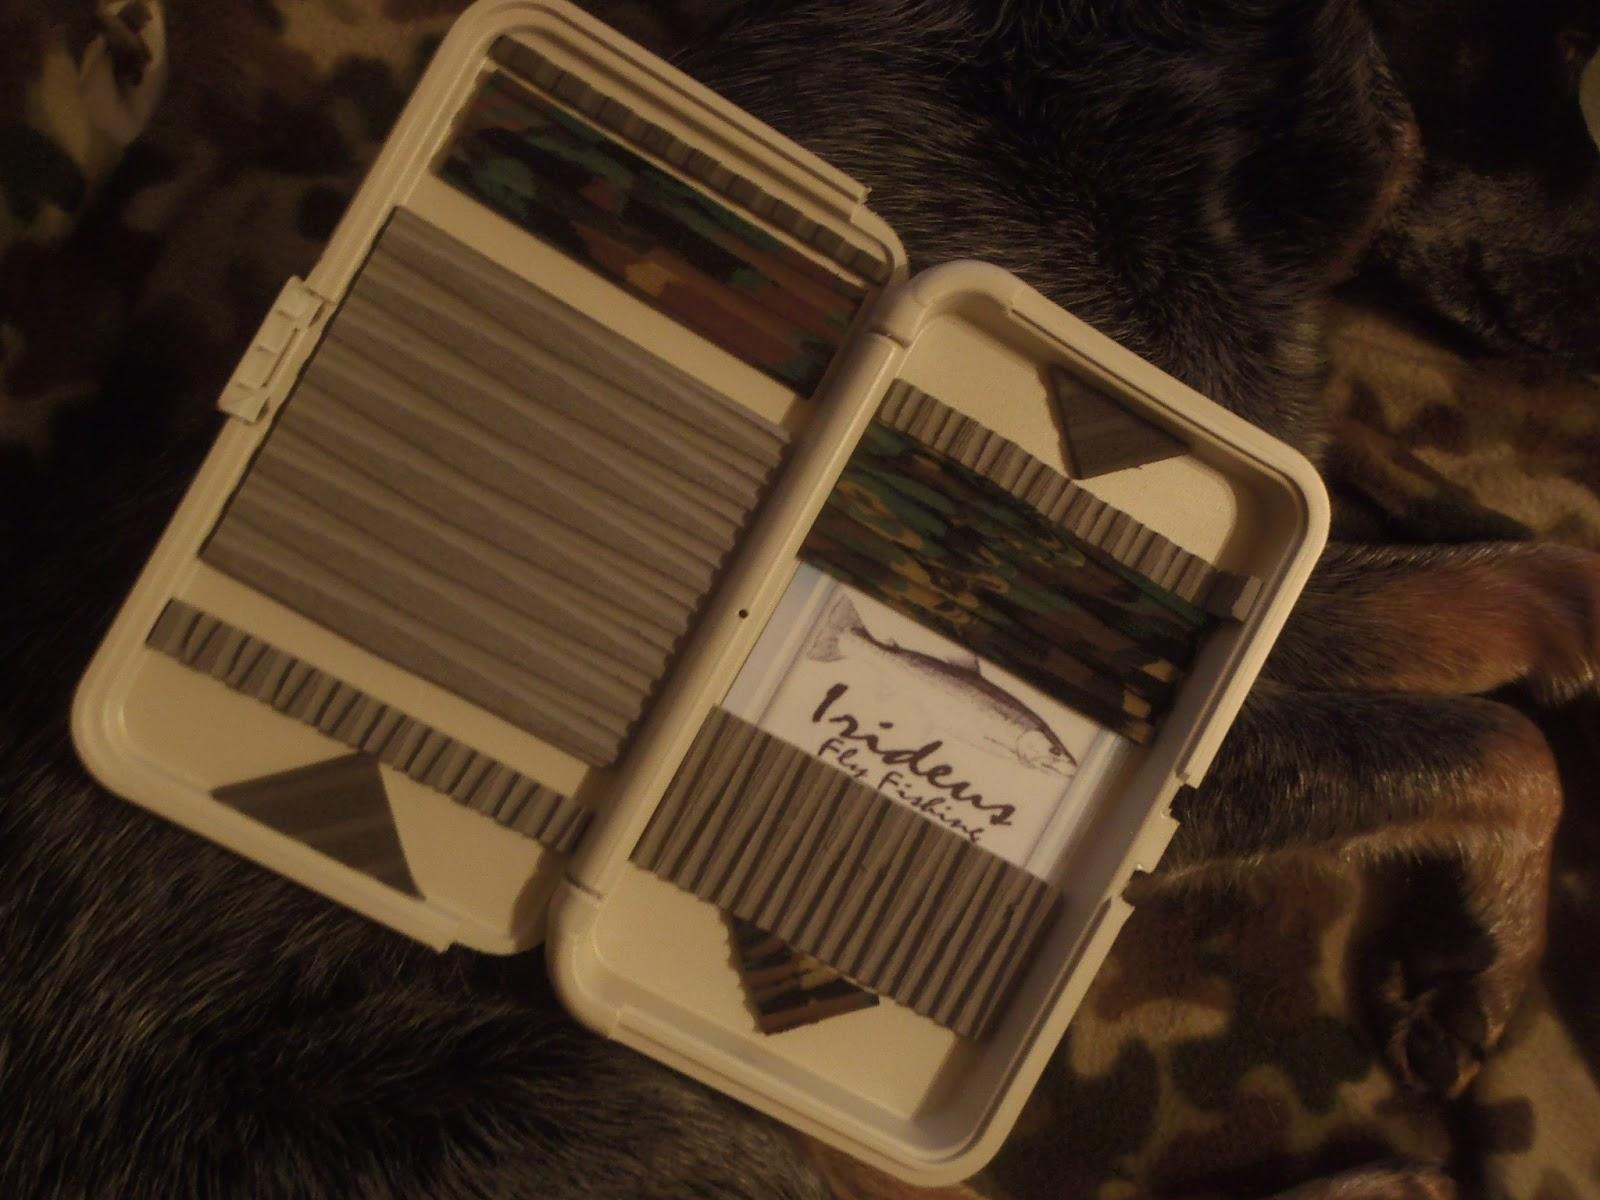 Irideus fly fishing products irideus brings some 2013 for Fly fishing box